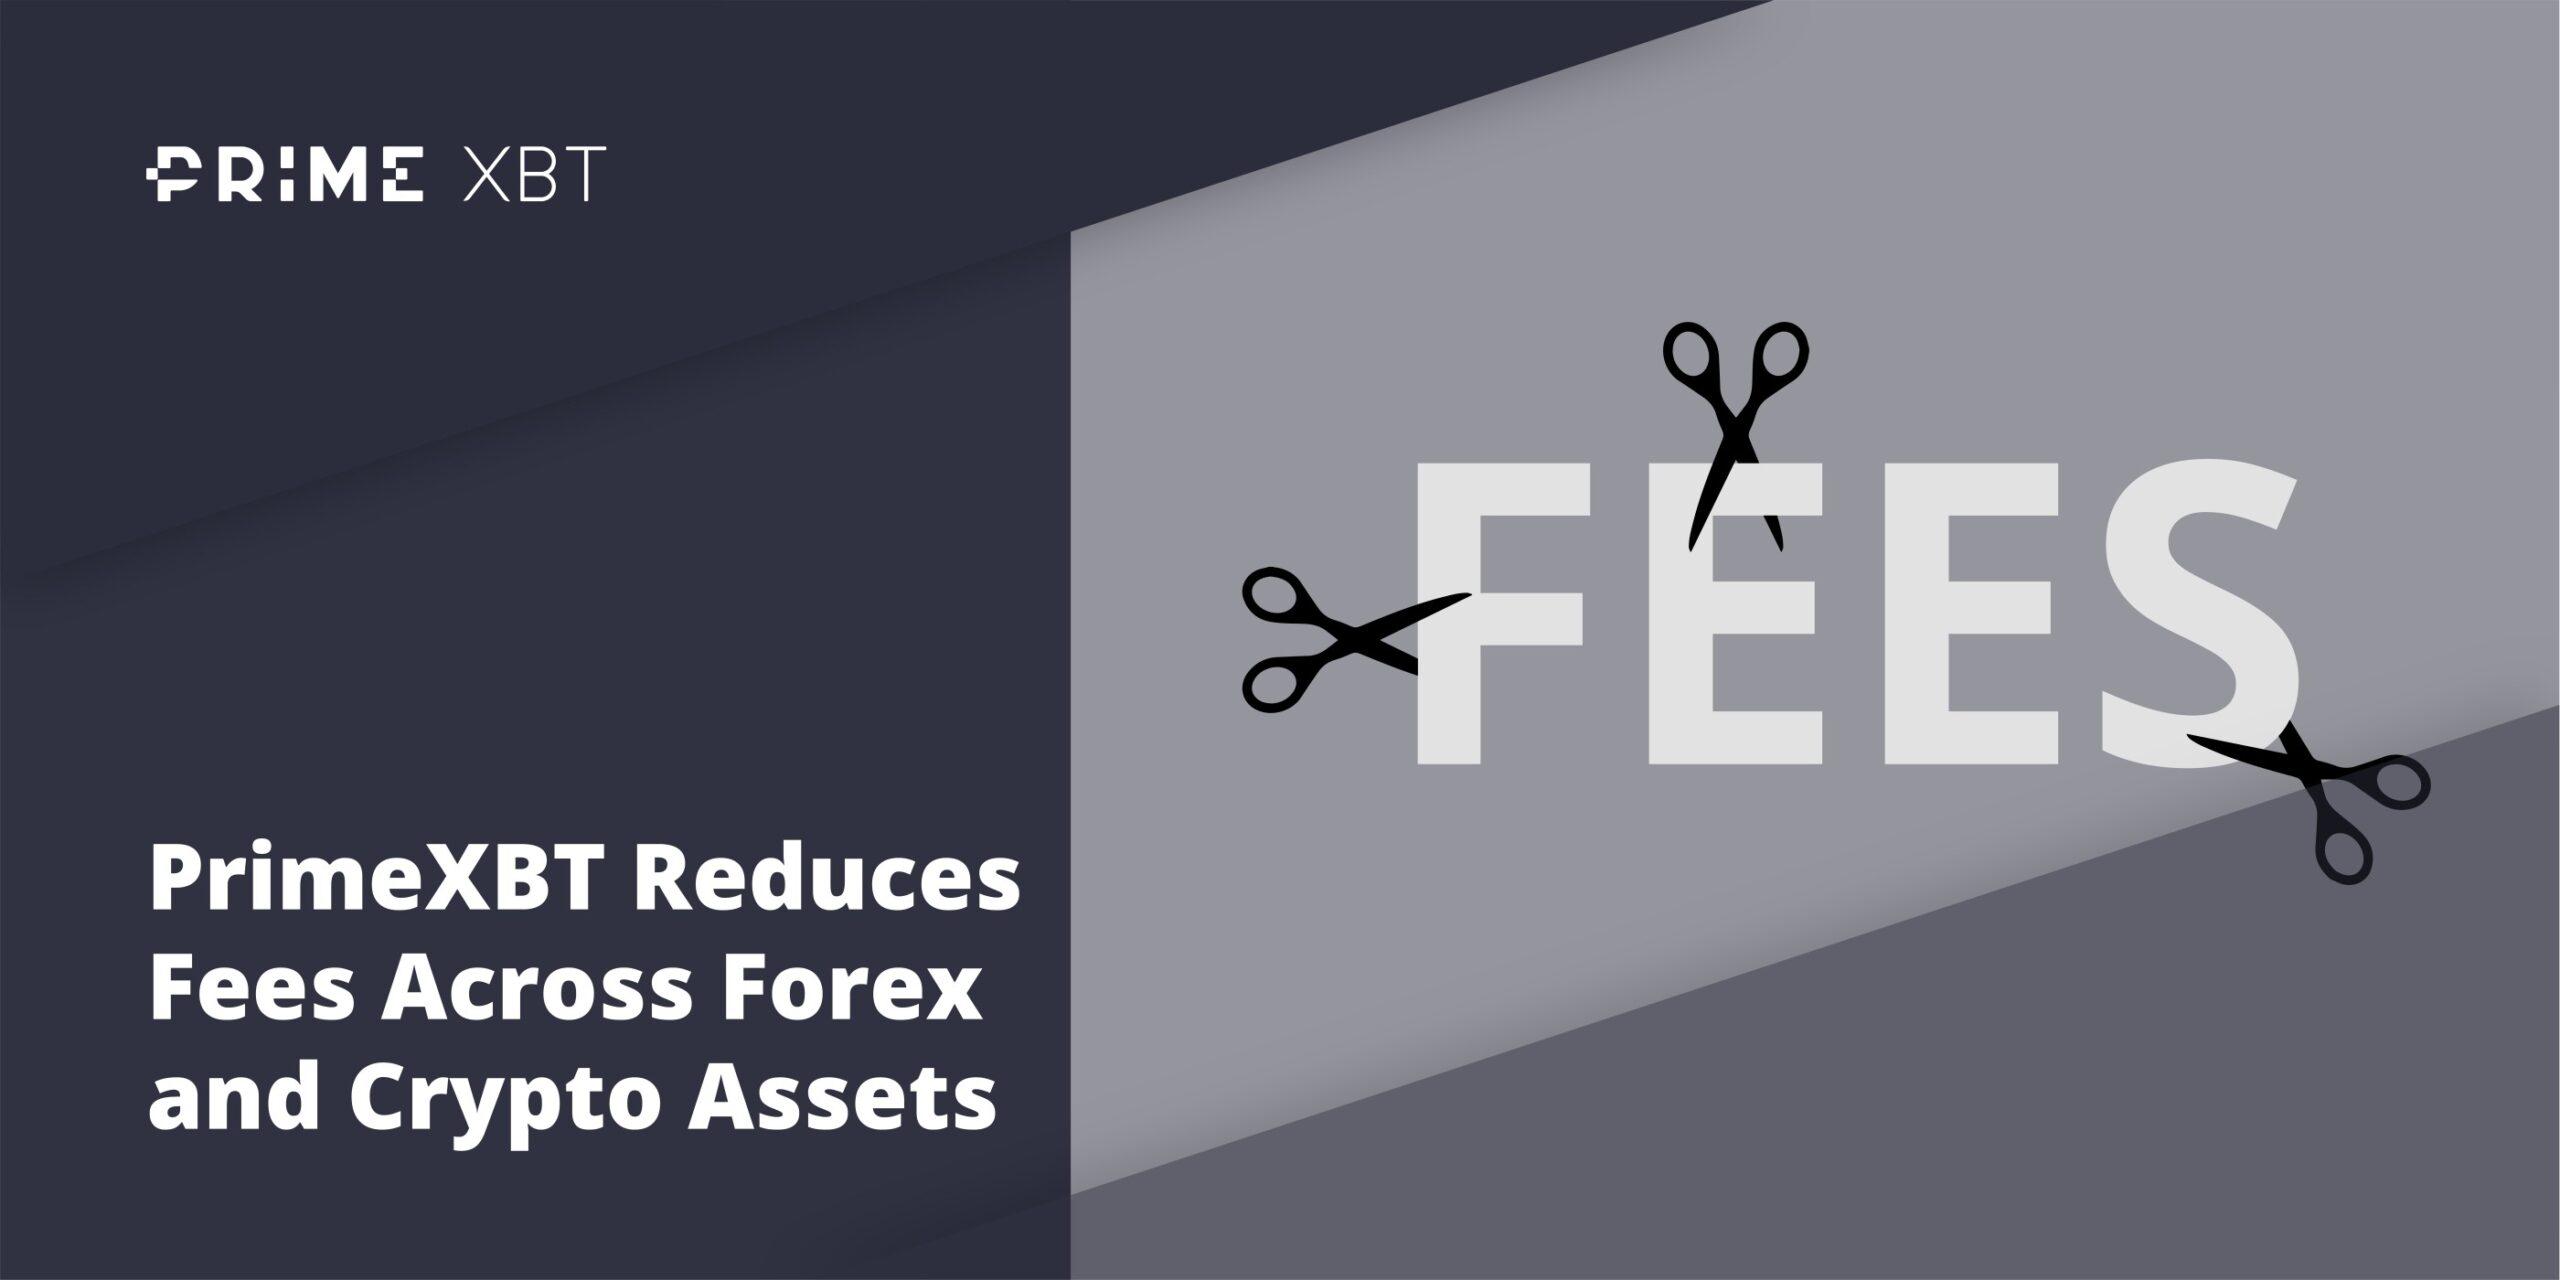 PrimeXBT Fees lowered